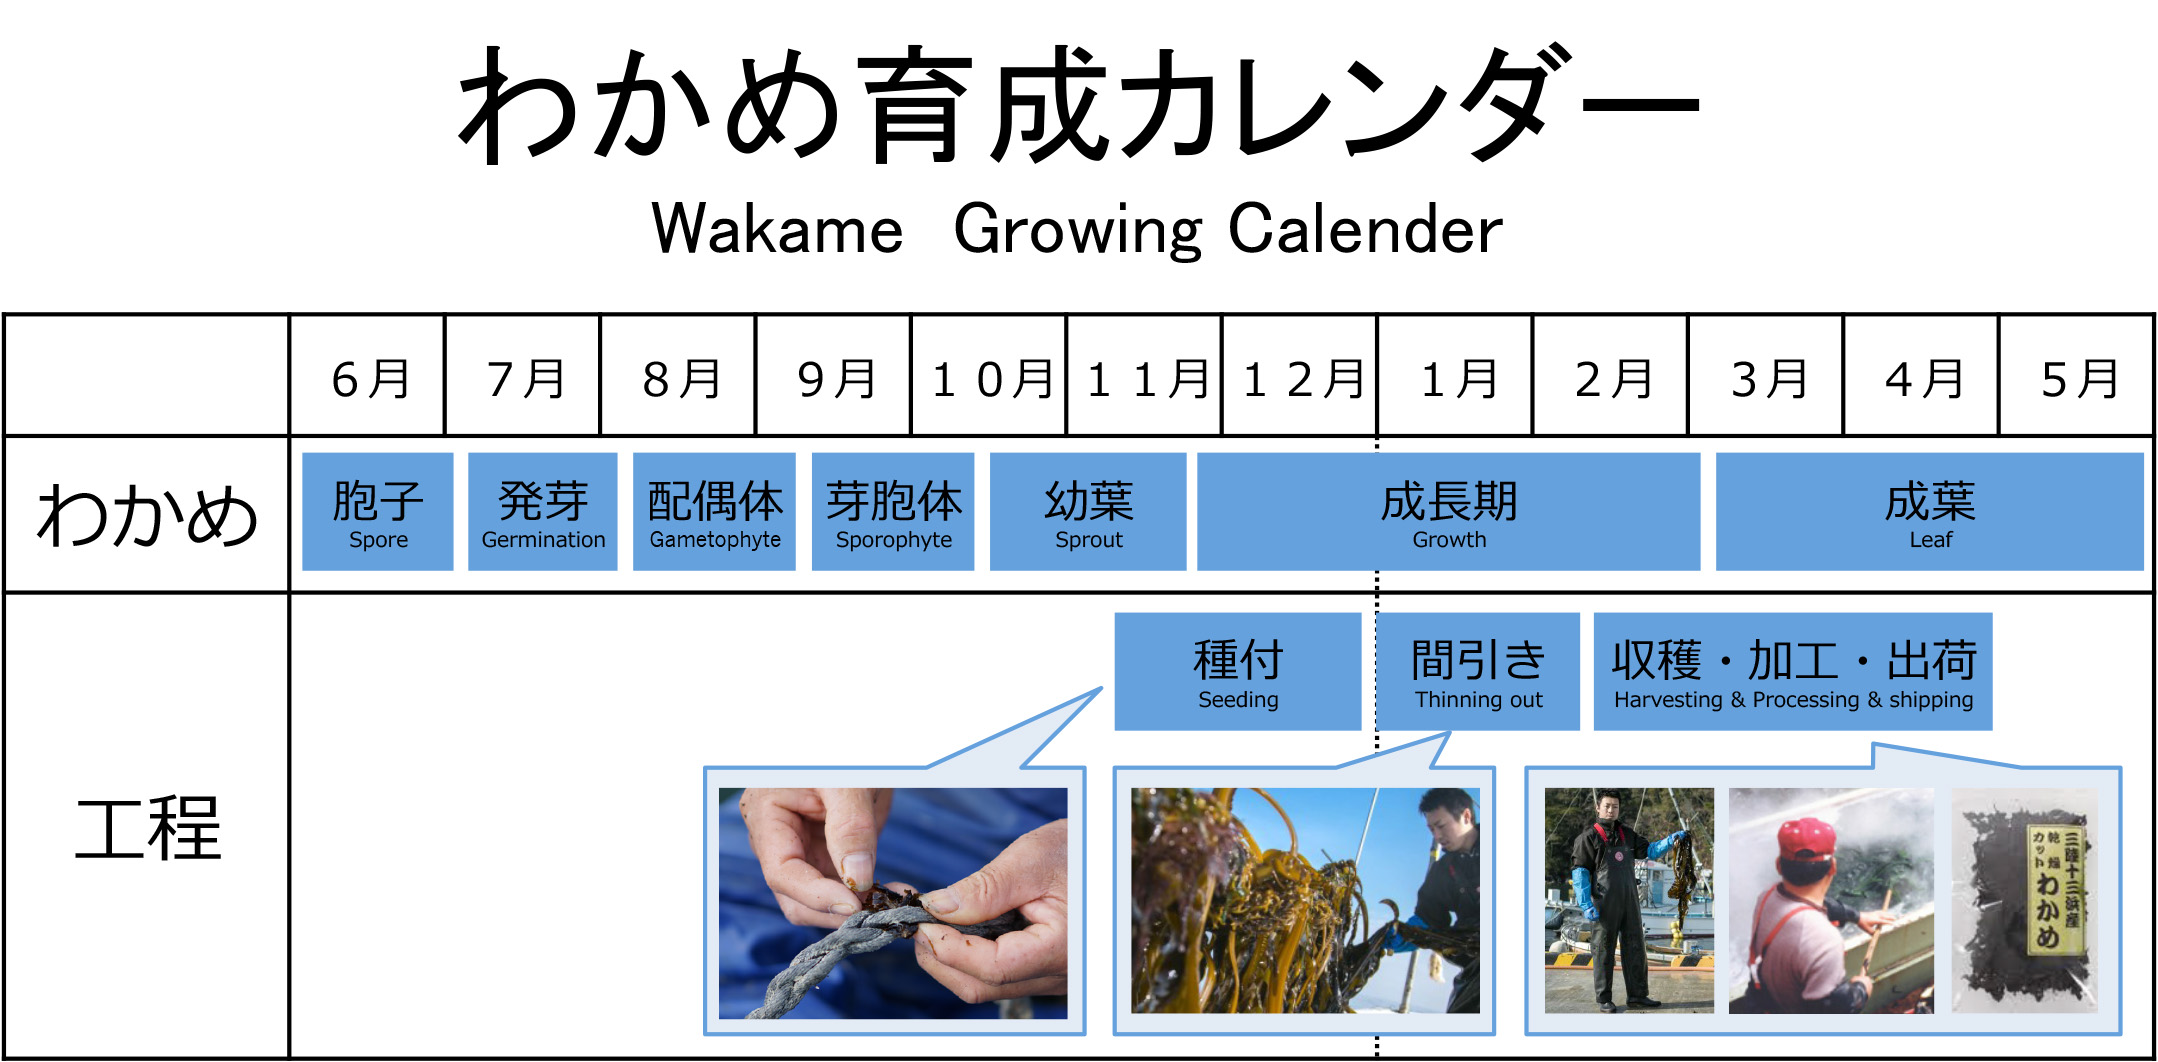 wakame_calender